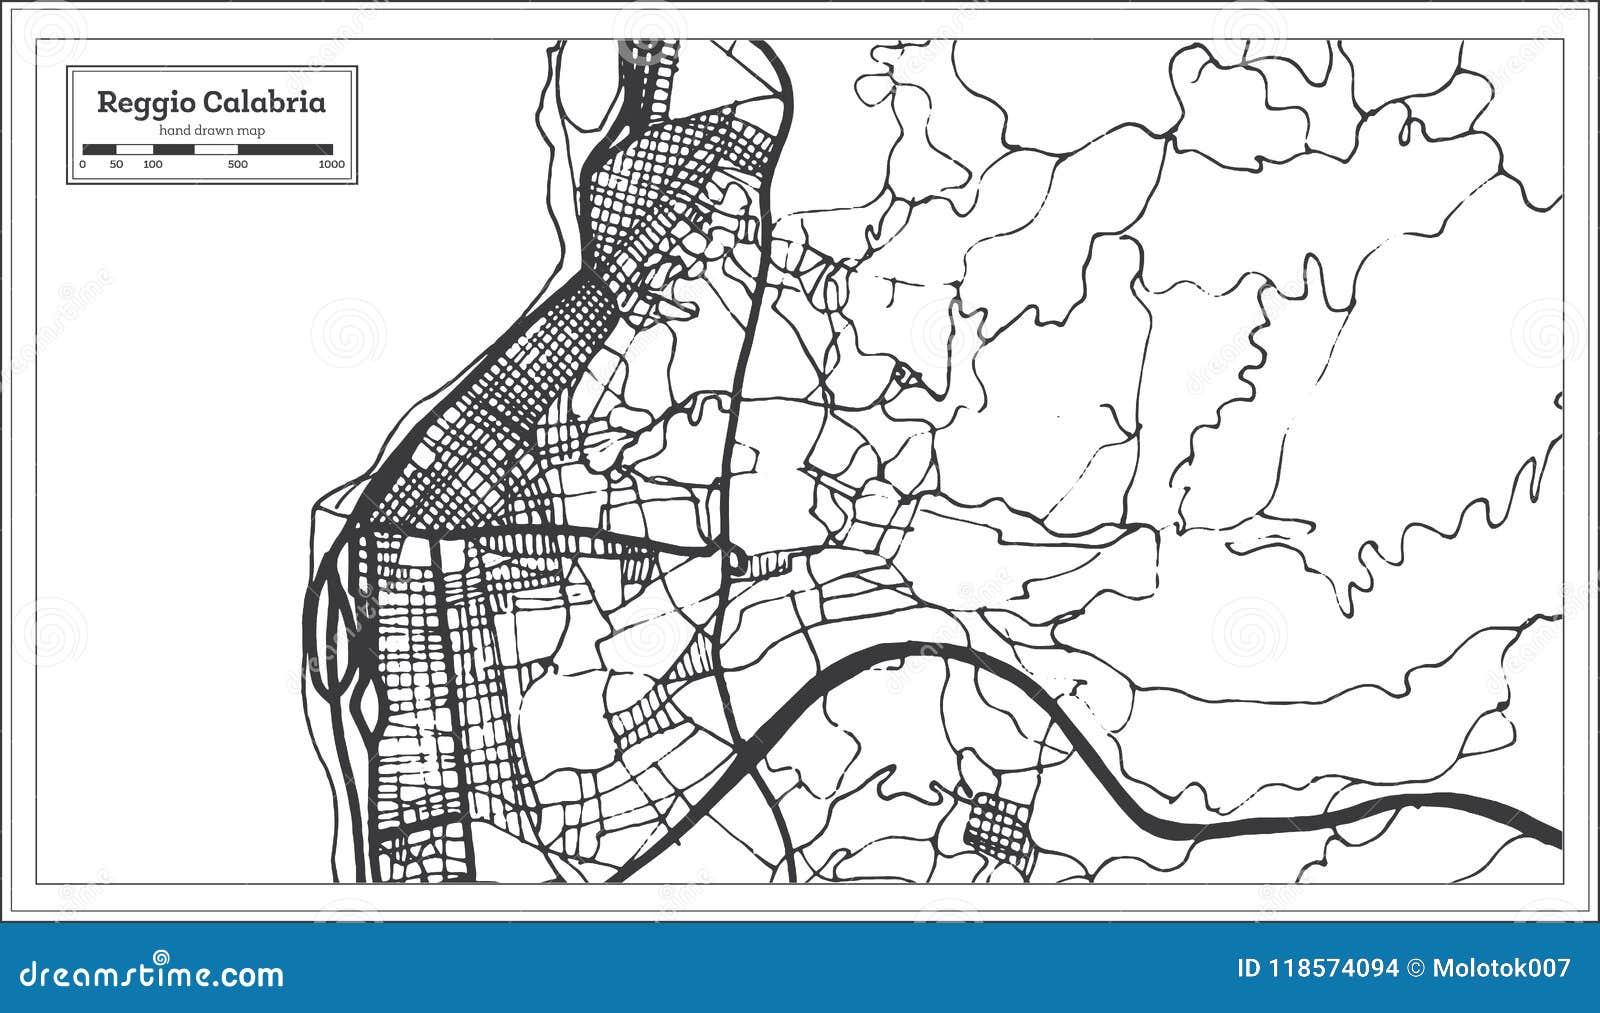 Reggio Calabria Italy City Map In Retro Style. Outline Map. Stock ...